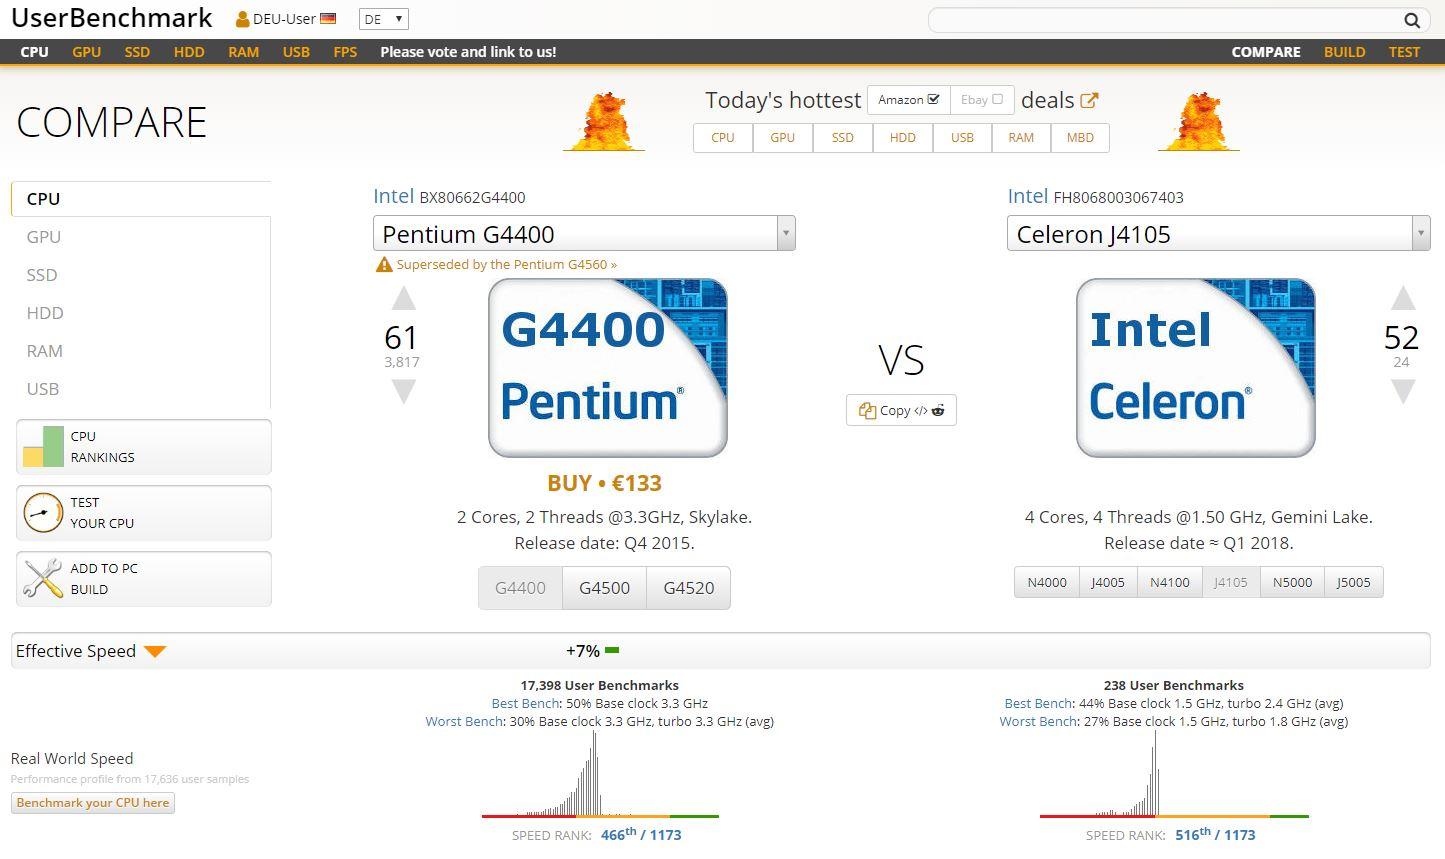 Benchmark with Intel Pentium G4400 and Intel Celeron J4105